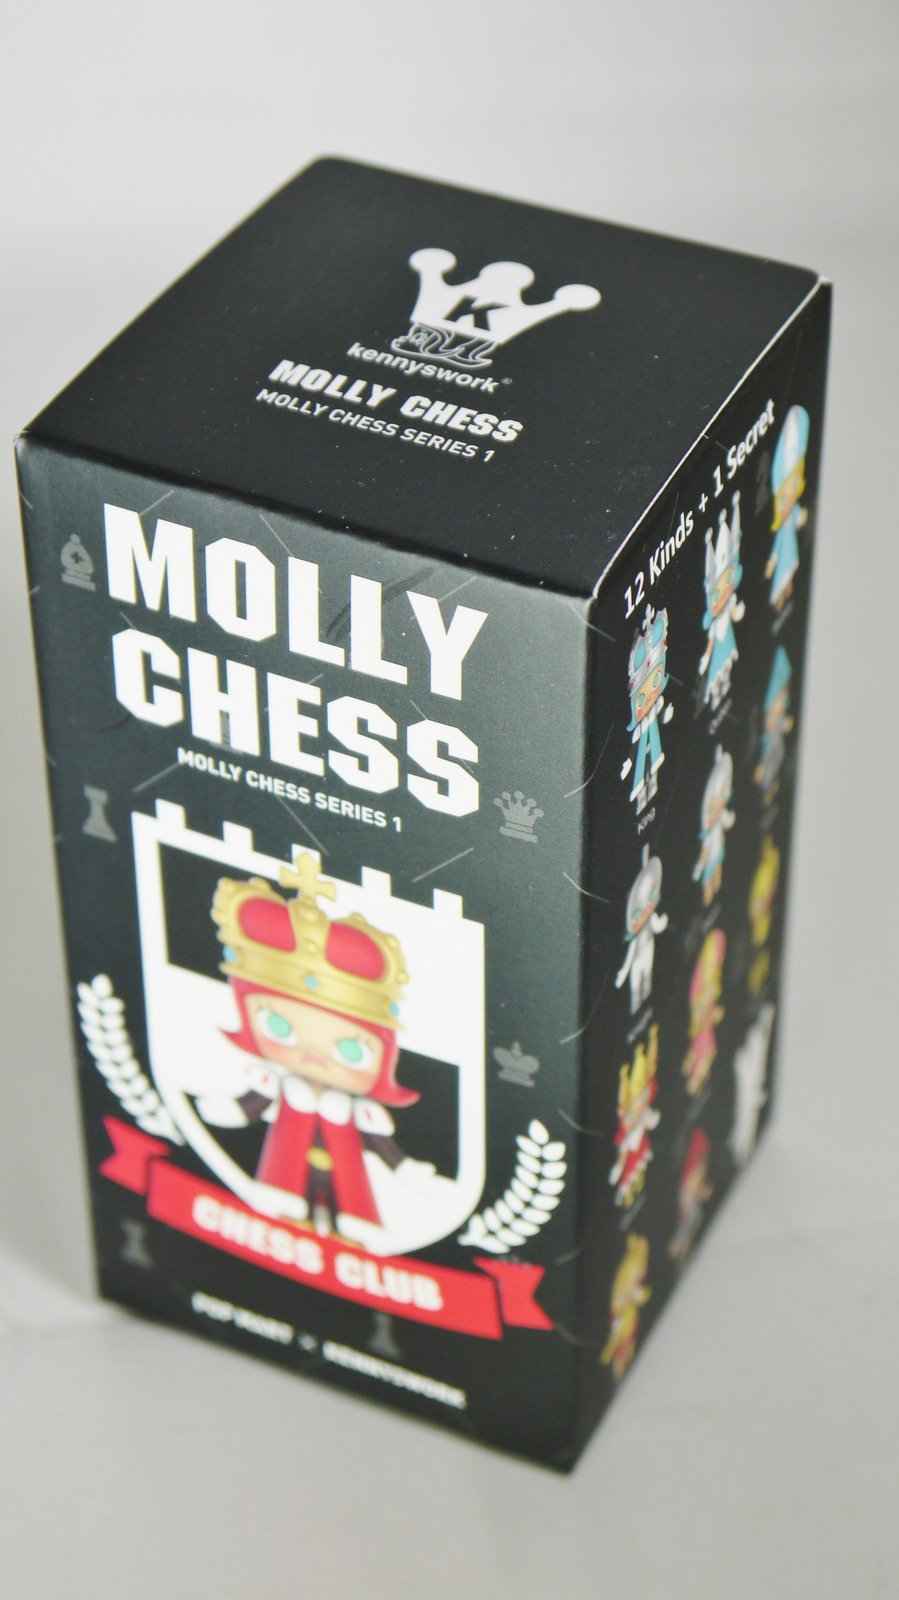 POP MART Kennyswork BLOCK Little Molly Chess Club Chessmate KNIGHT Gold & Black